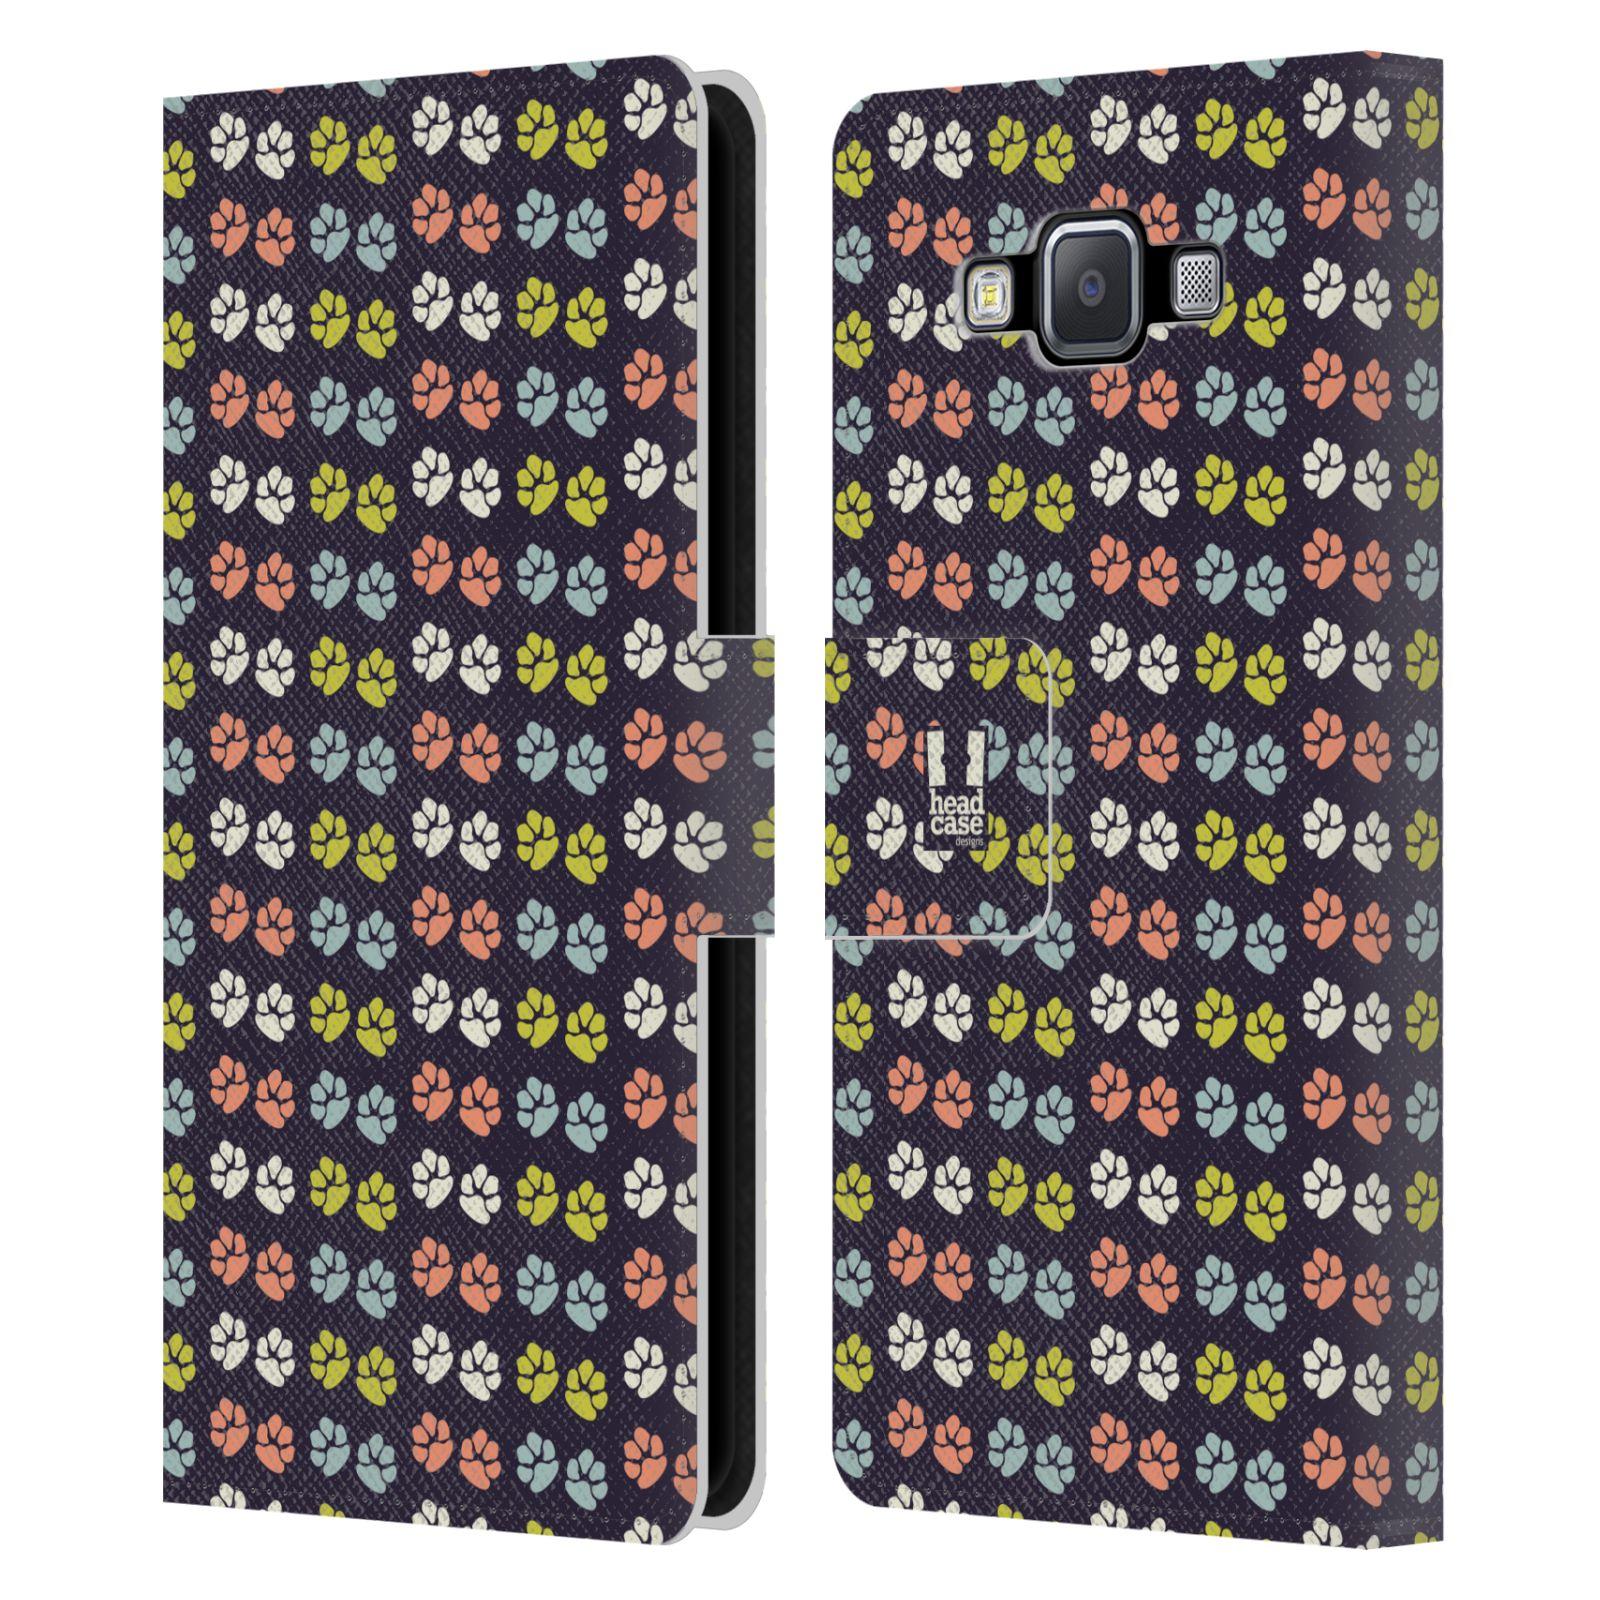 HEAD CASE Flipové pouzdro pro mobil Samsung Galaxy A5 Pejsek ťapky barevné RETRO